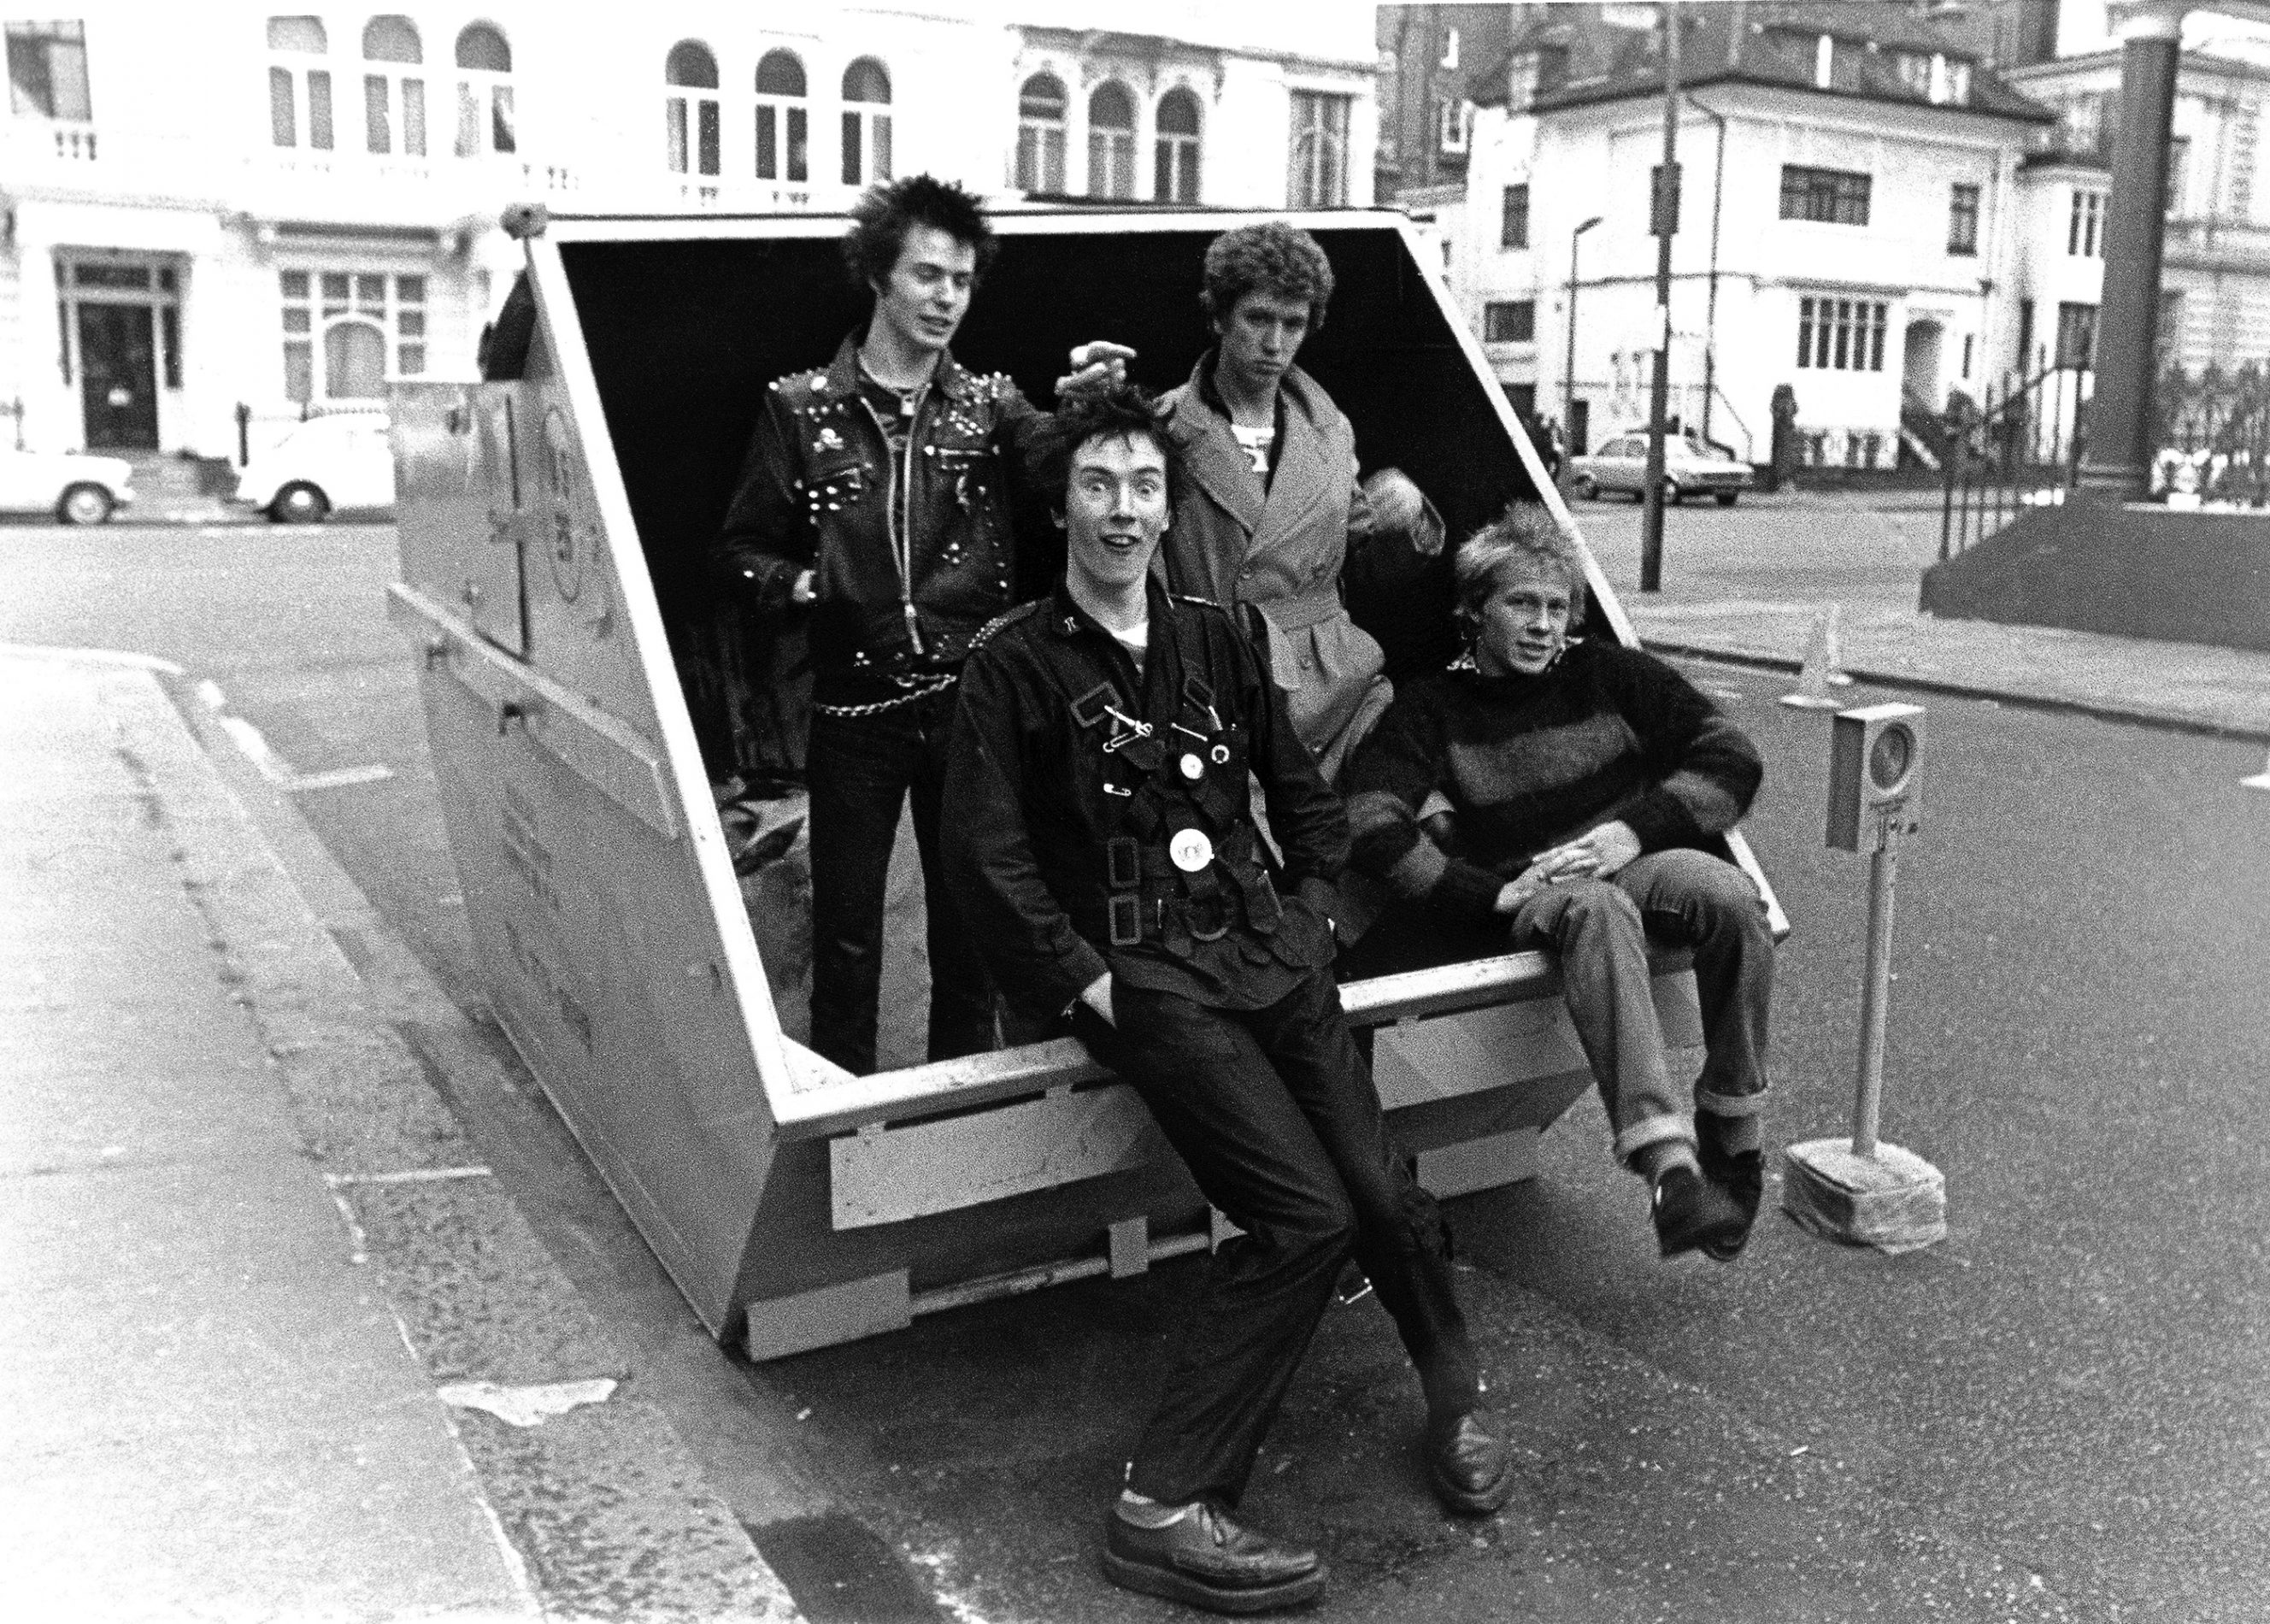 Sex Pistols, Hyde Park, 1977 © Janette Beckman